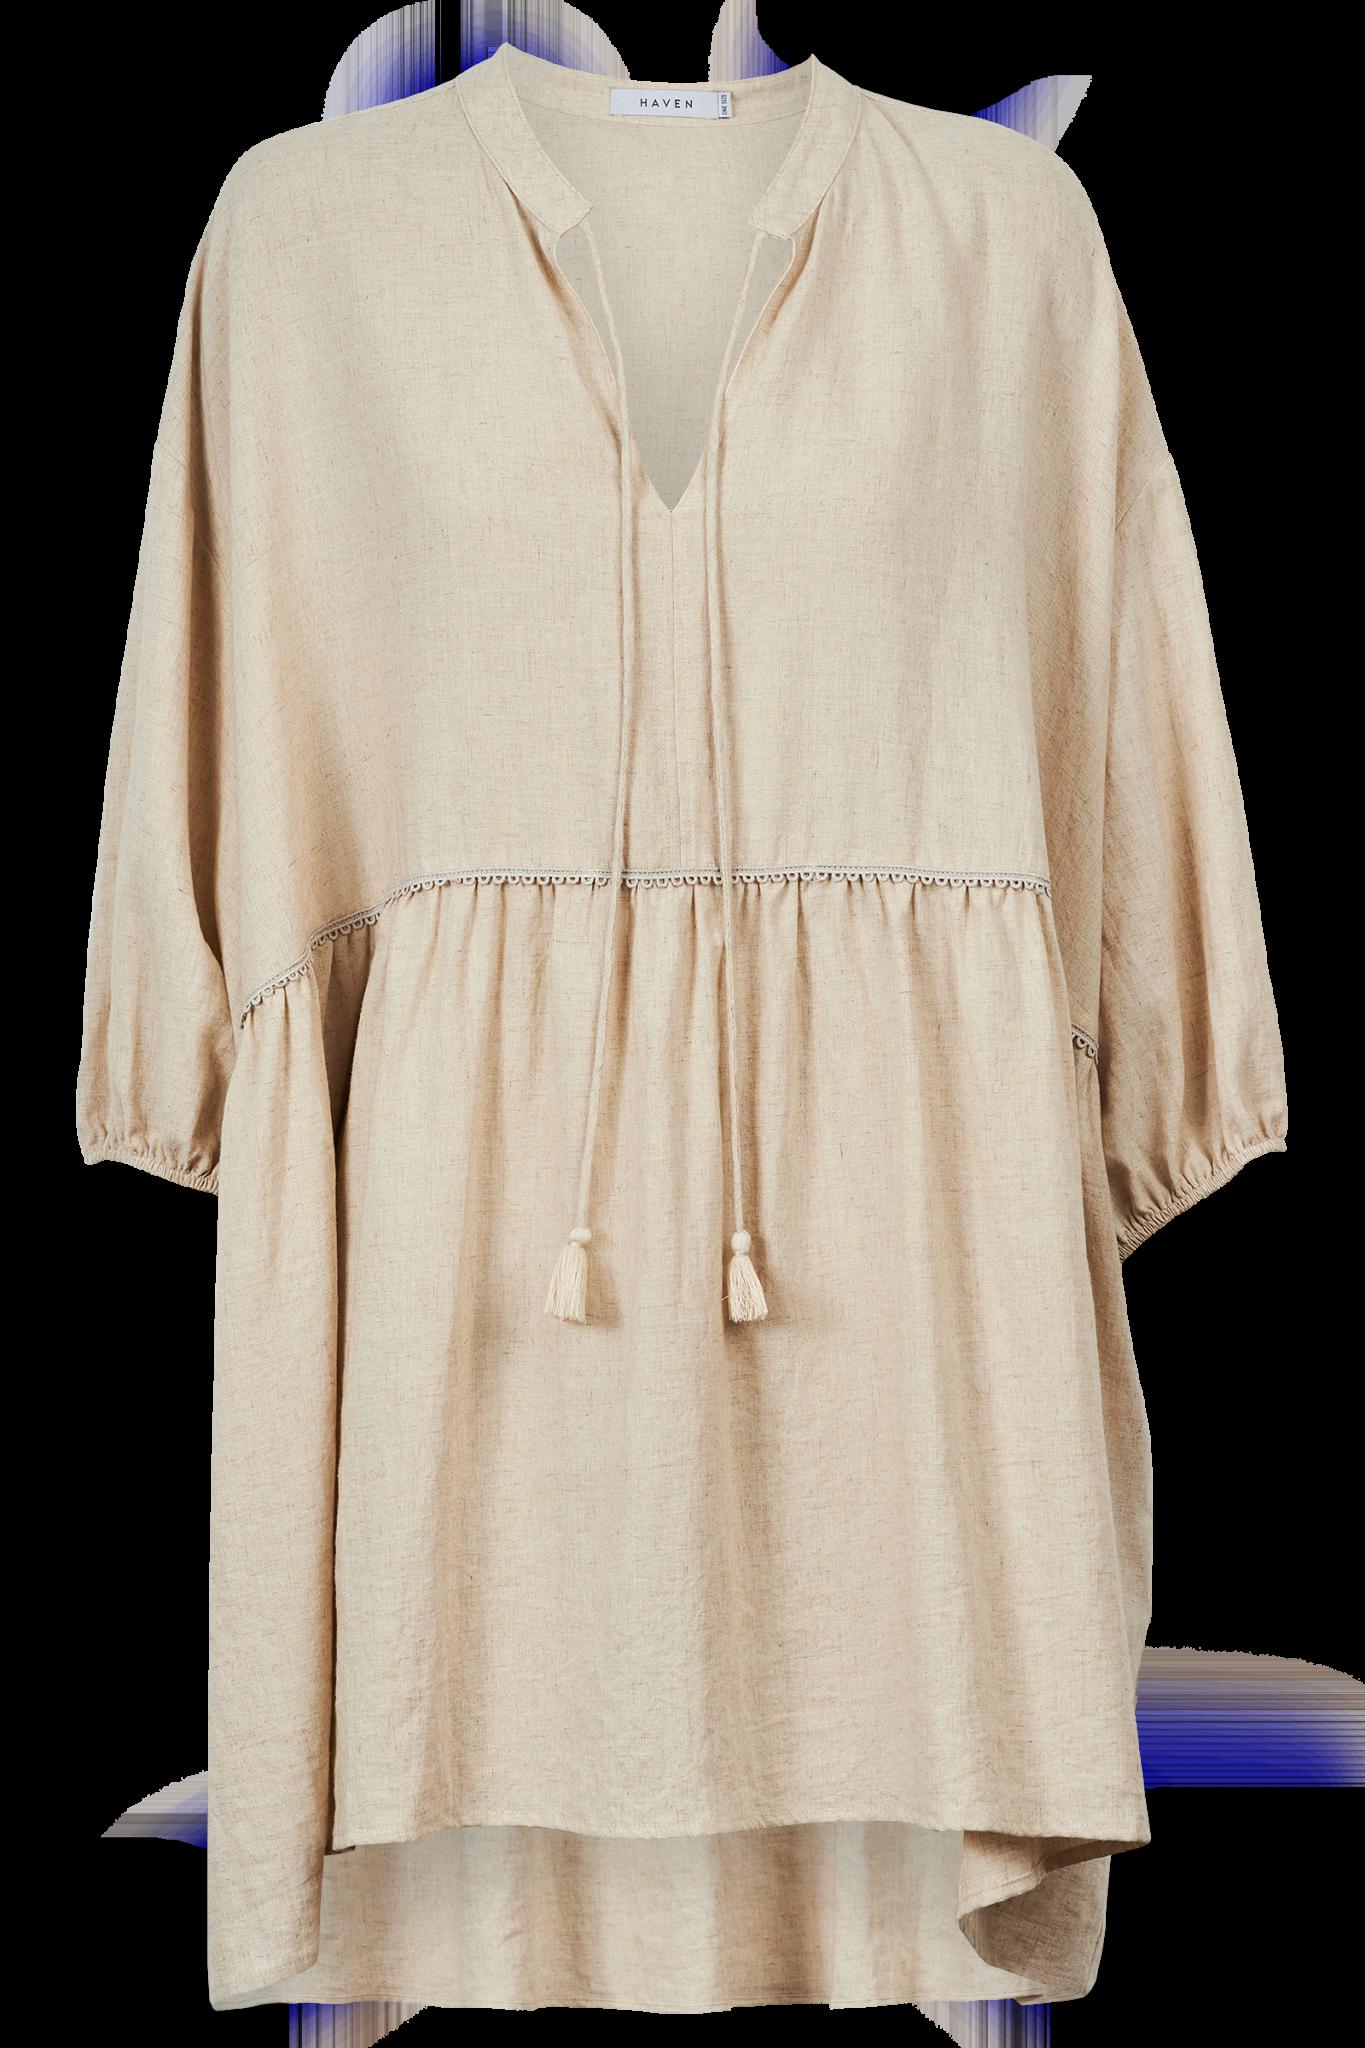 Haven Nevis Top/Dress OS